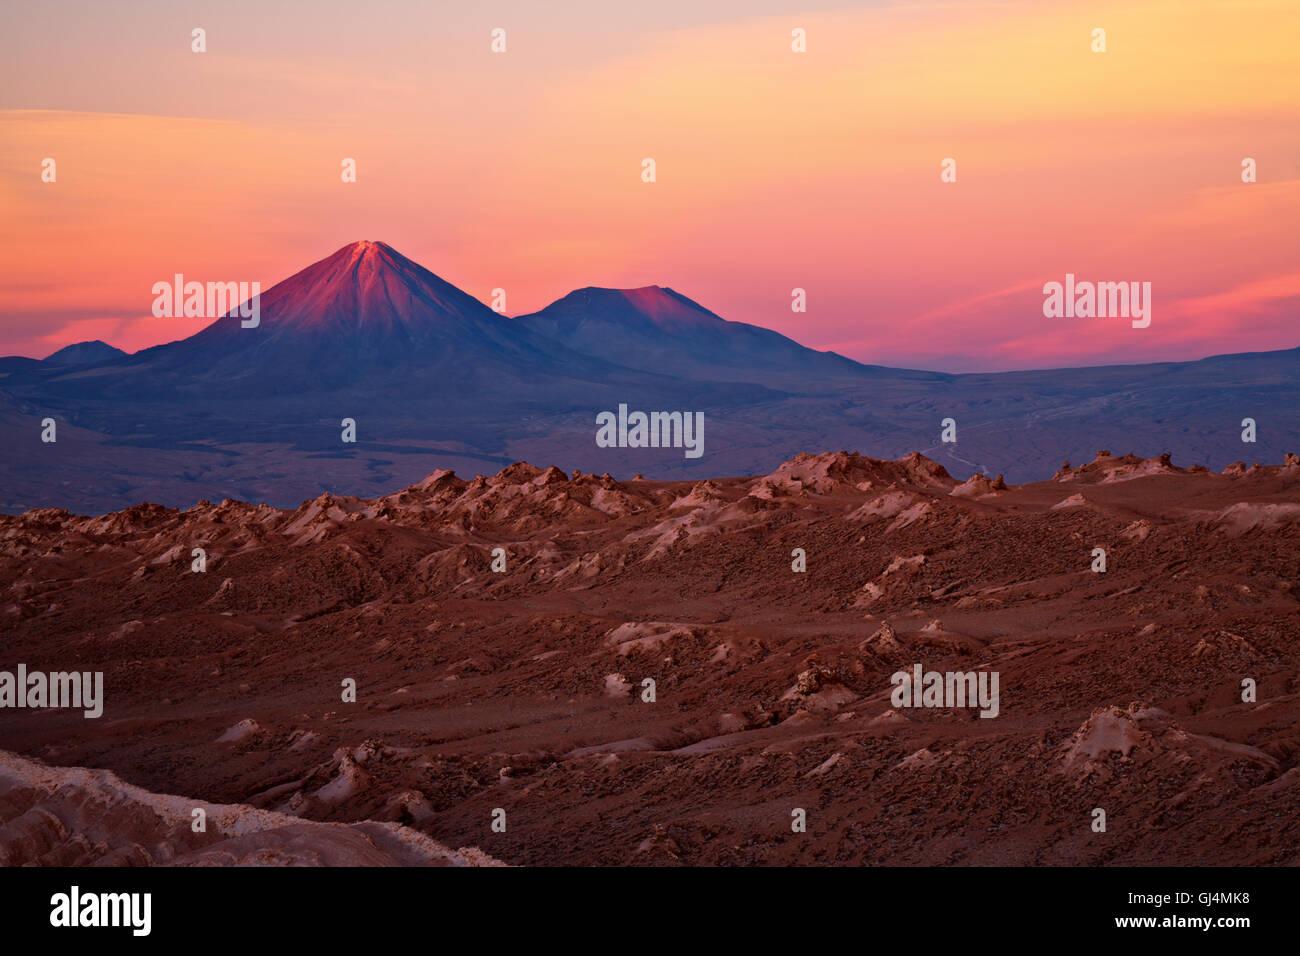 sunset over volcanoes Licancabur and Juriques and Valle de la Luna, Atacama desert, Chile - Stock Image